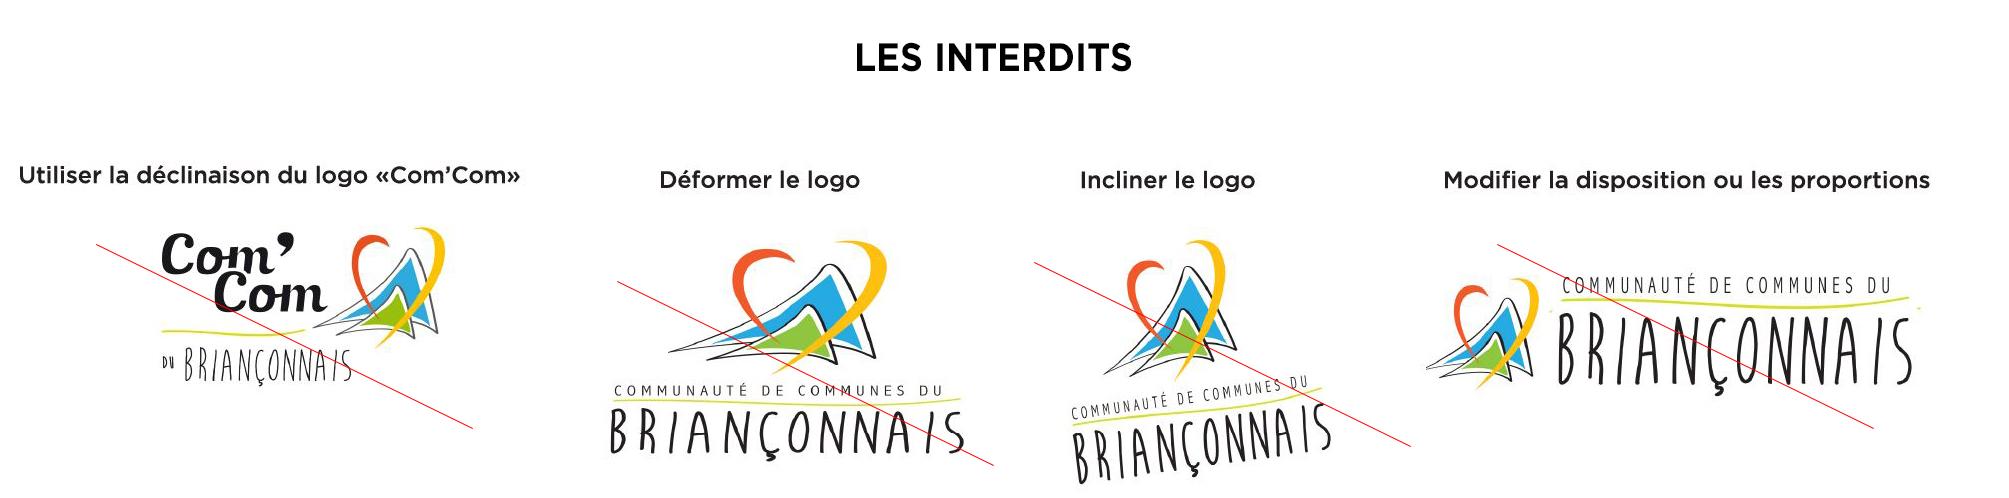 interdits_logos_ccb.jpg